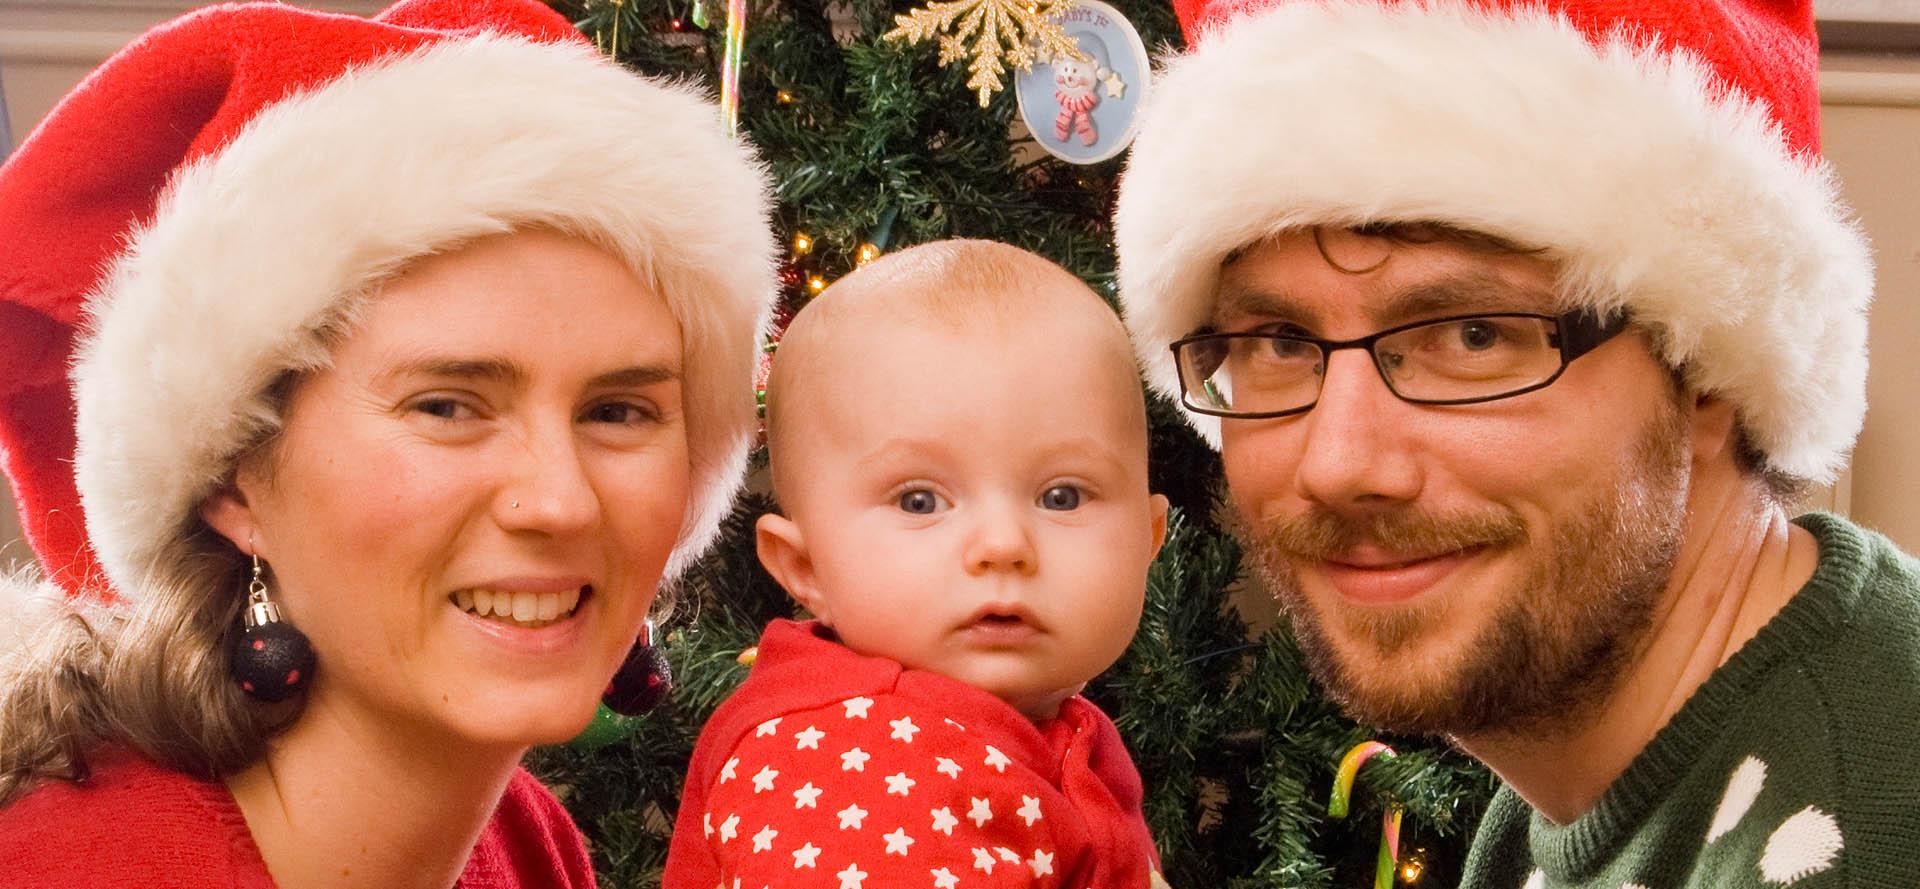 Baby photographer Belfast - Christmas family photography photo